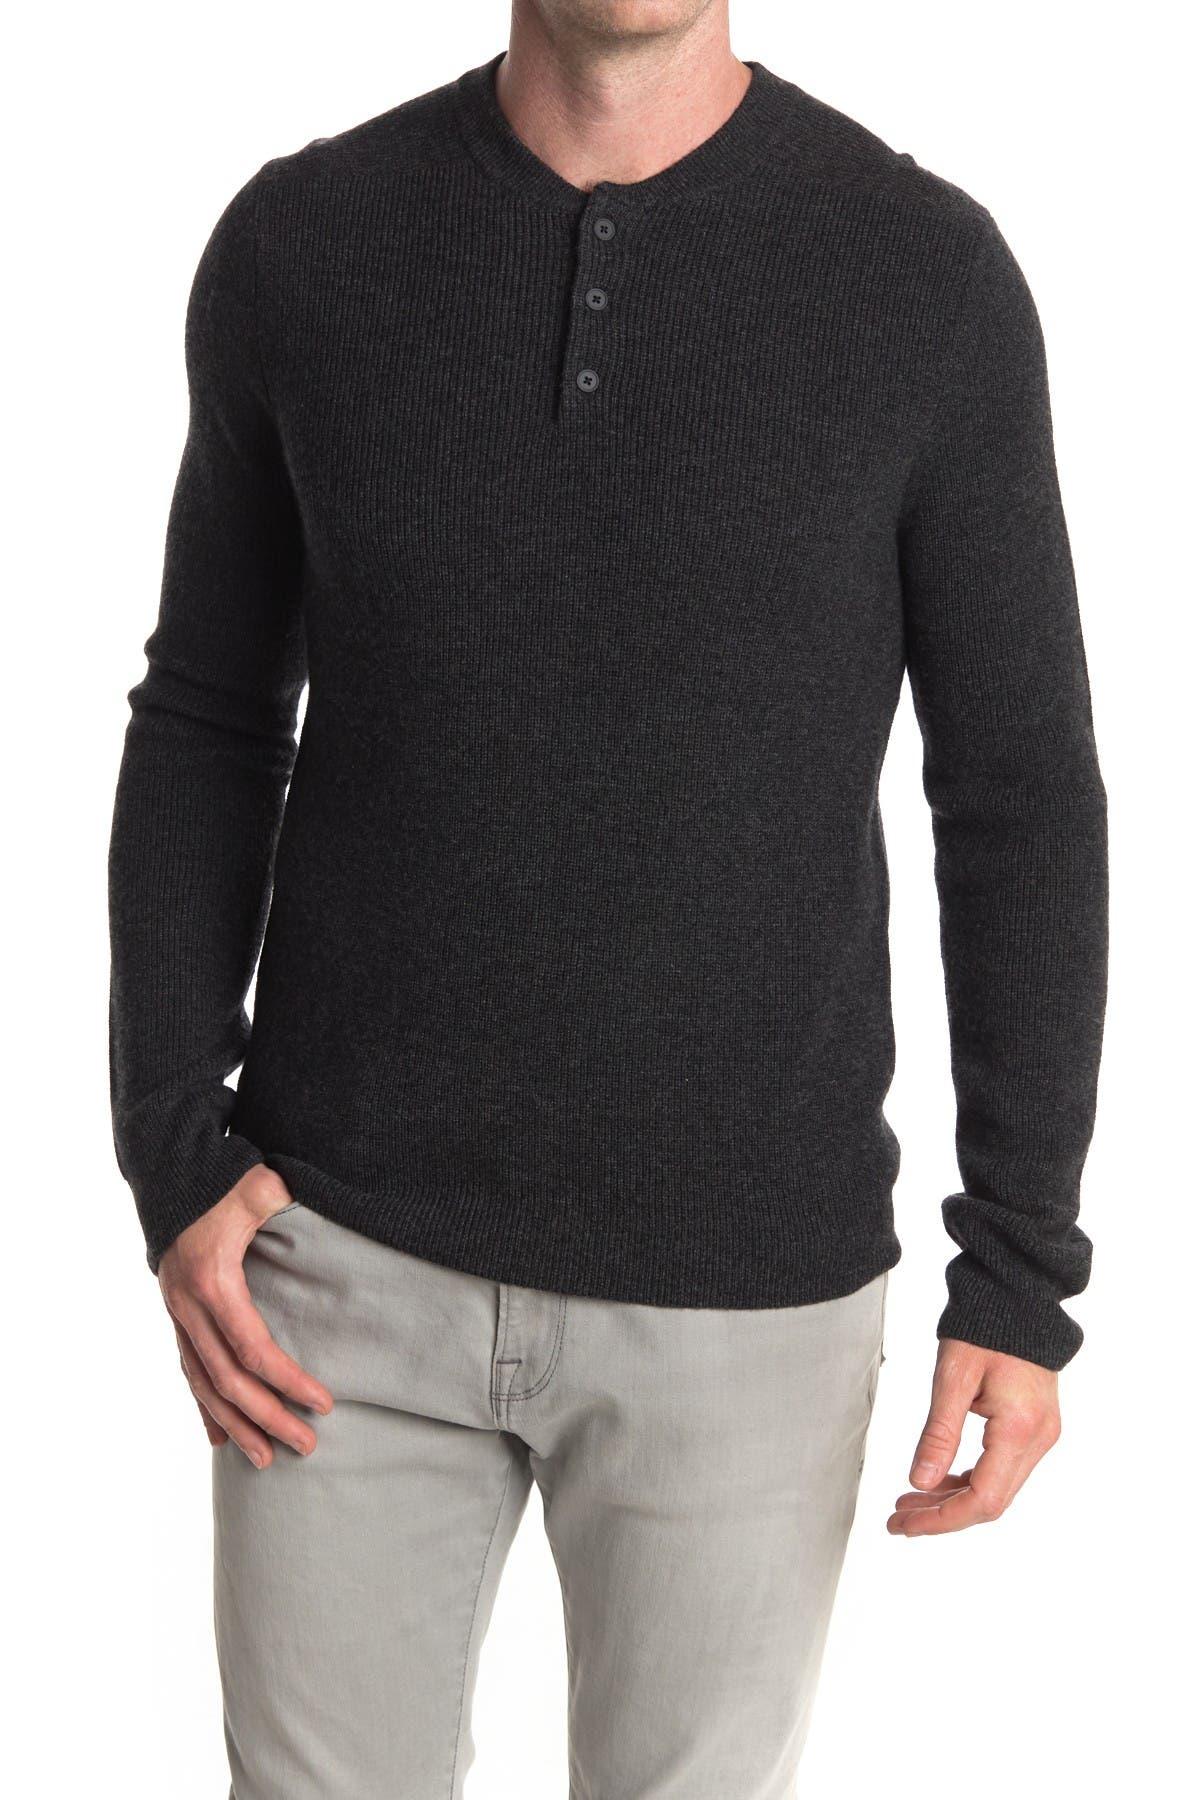 Image of Stewart of Scotland Wool Cashmere Blend Long Sleeve Henley